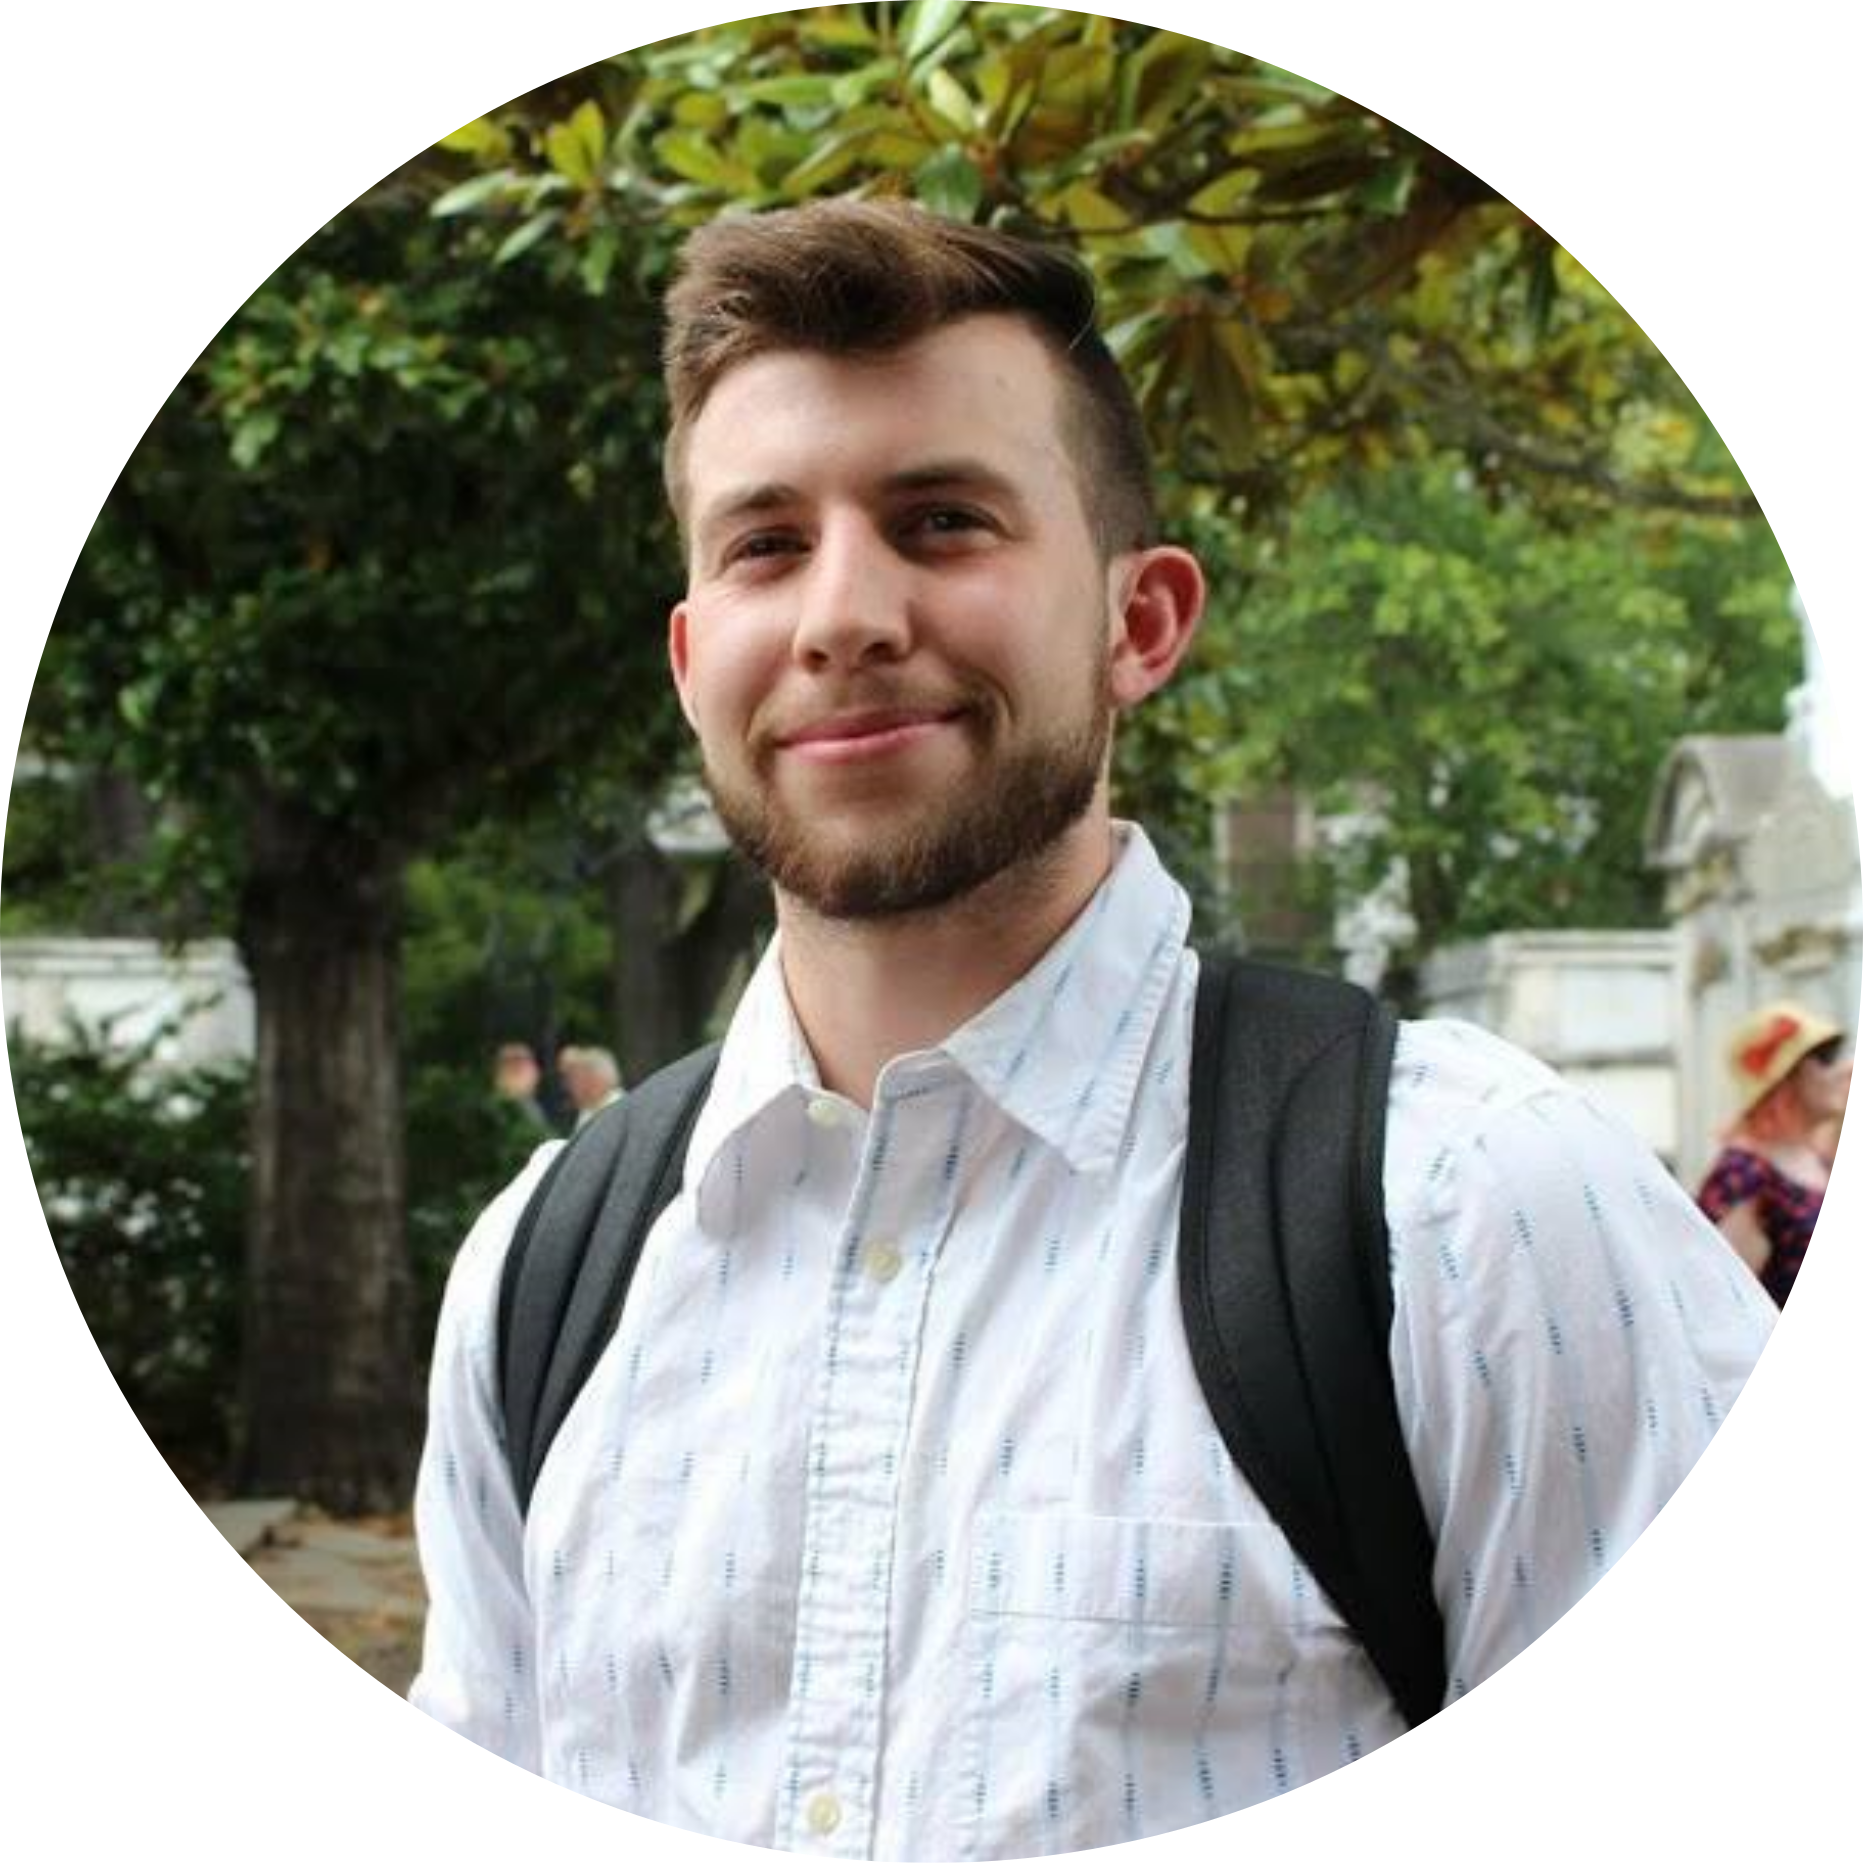 Alex Turgeon - Business Development, Partner Outreach, Marketing